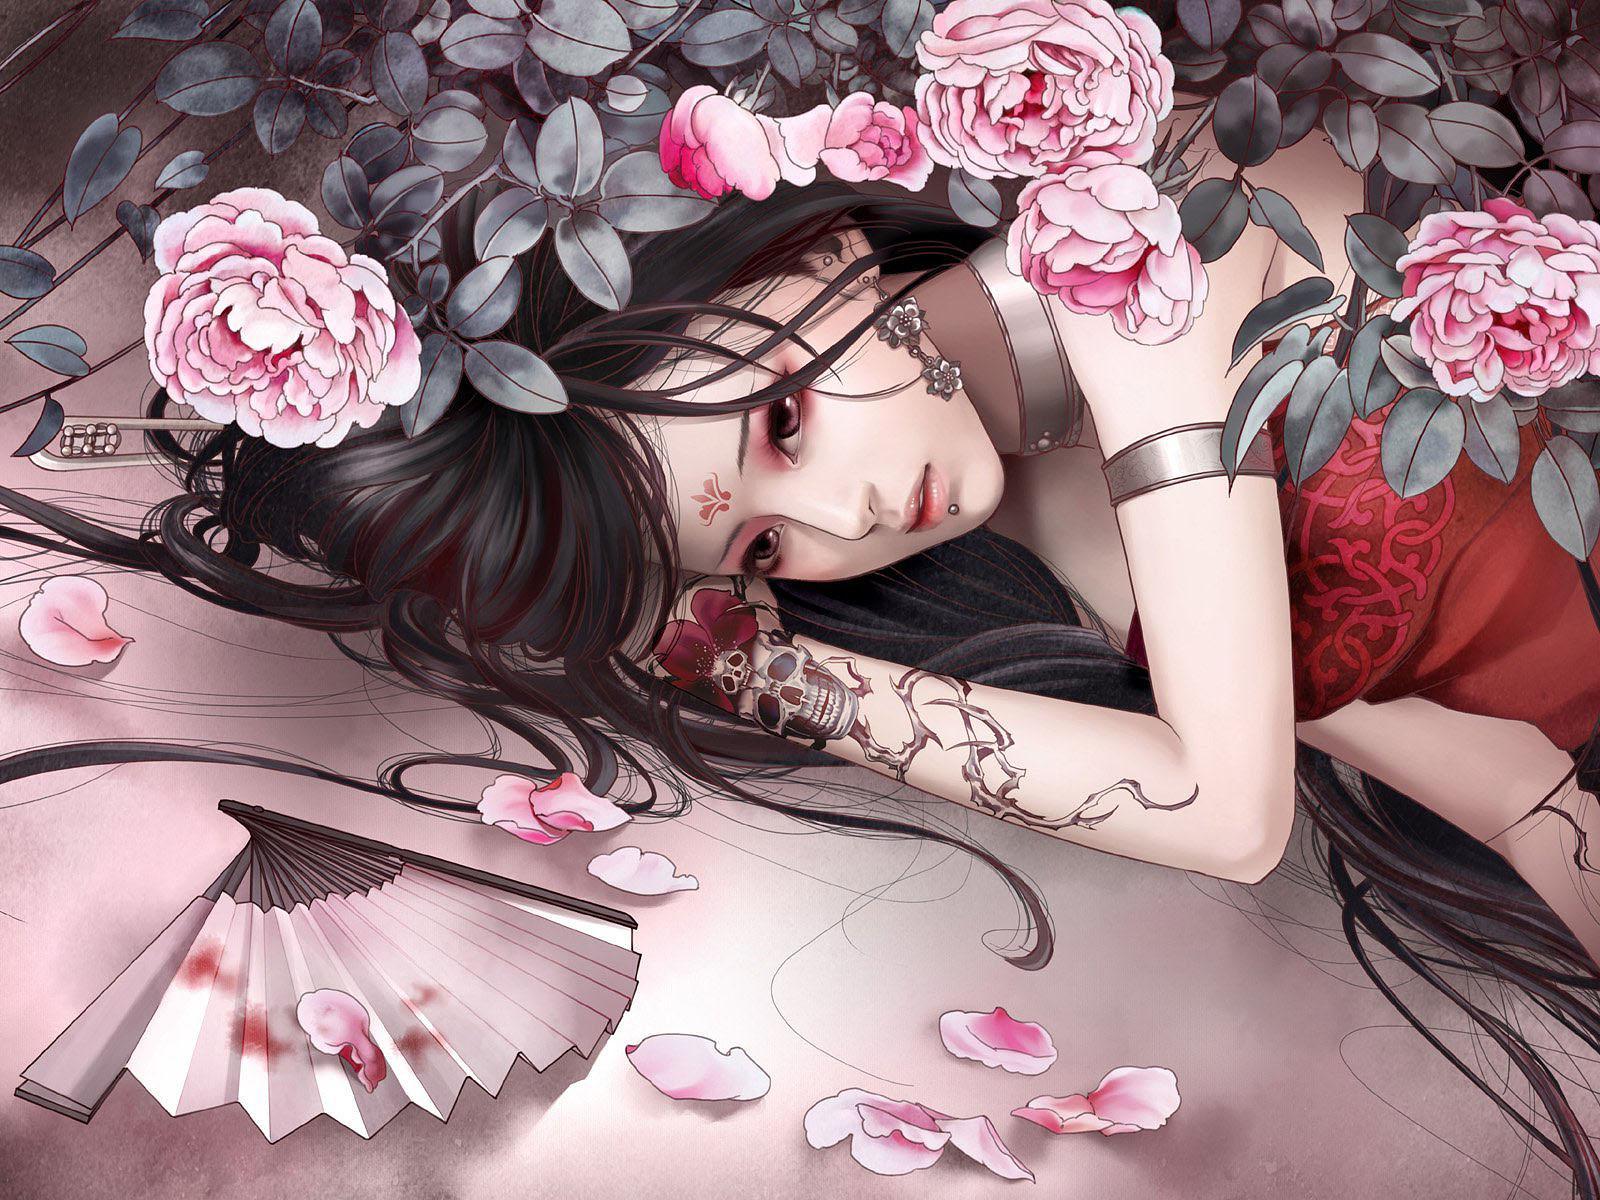 http://4.bp.blogspot.com/-FGUftCEIxdg/UKyPAj1nBQI/AAAAAAAADnE/UHz6sz4k0Ig/s1600/Hd+Anime+Girl+Wallpaper.jpg